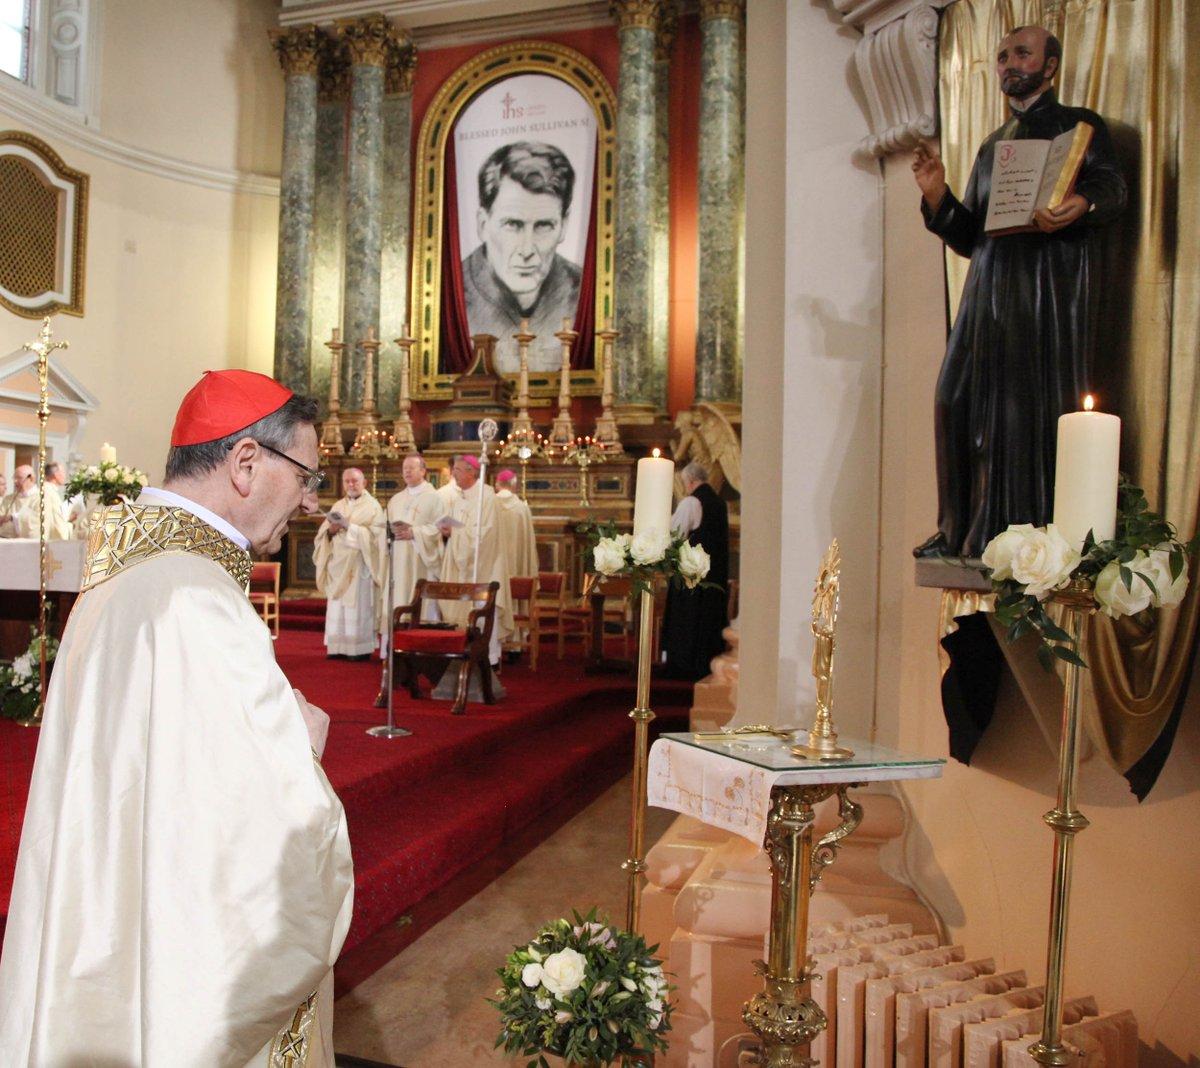 Beatification Mass for Bl John Sullivan 13 May 2017